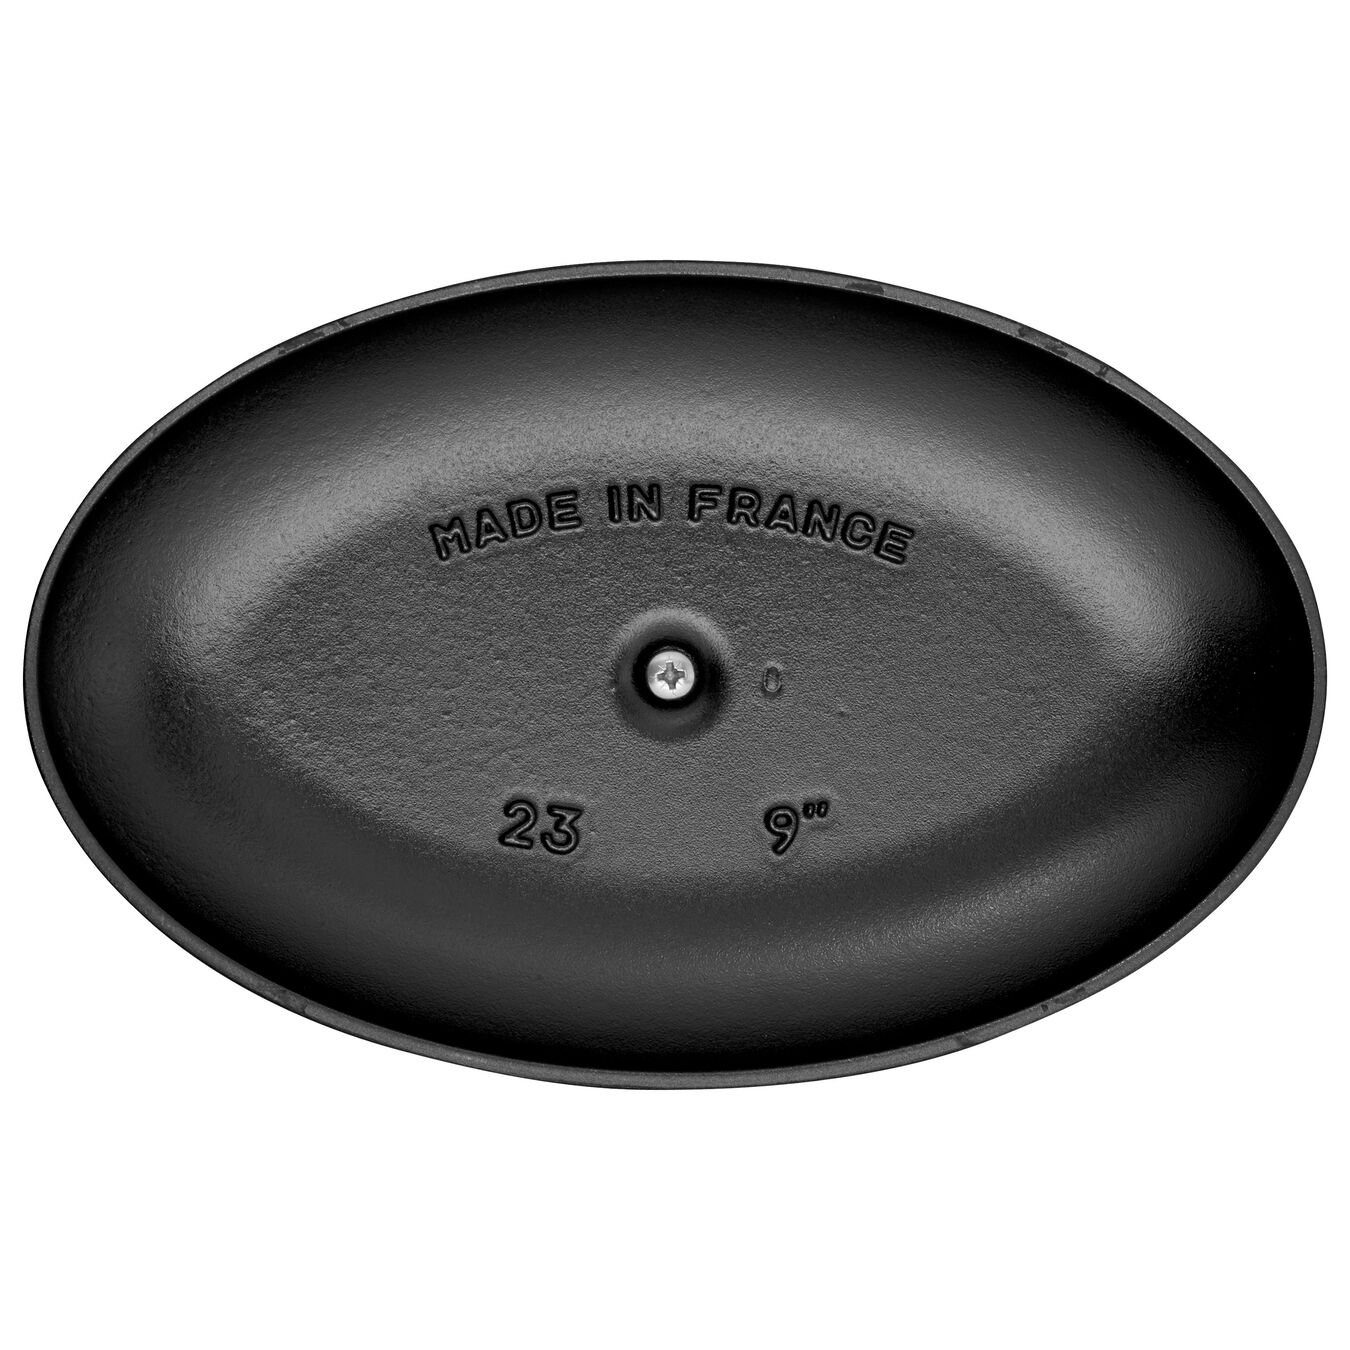 1.7 l Cast iron oval La Coquette, Black,,large 3